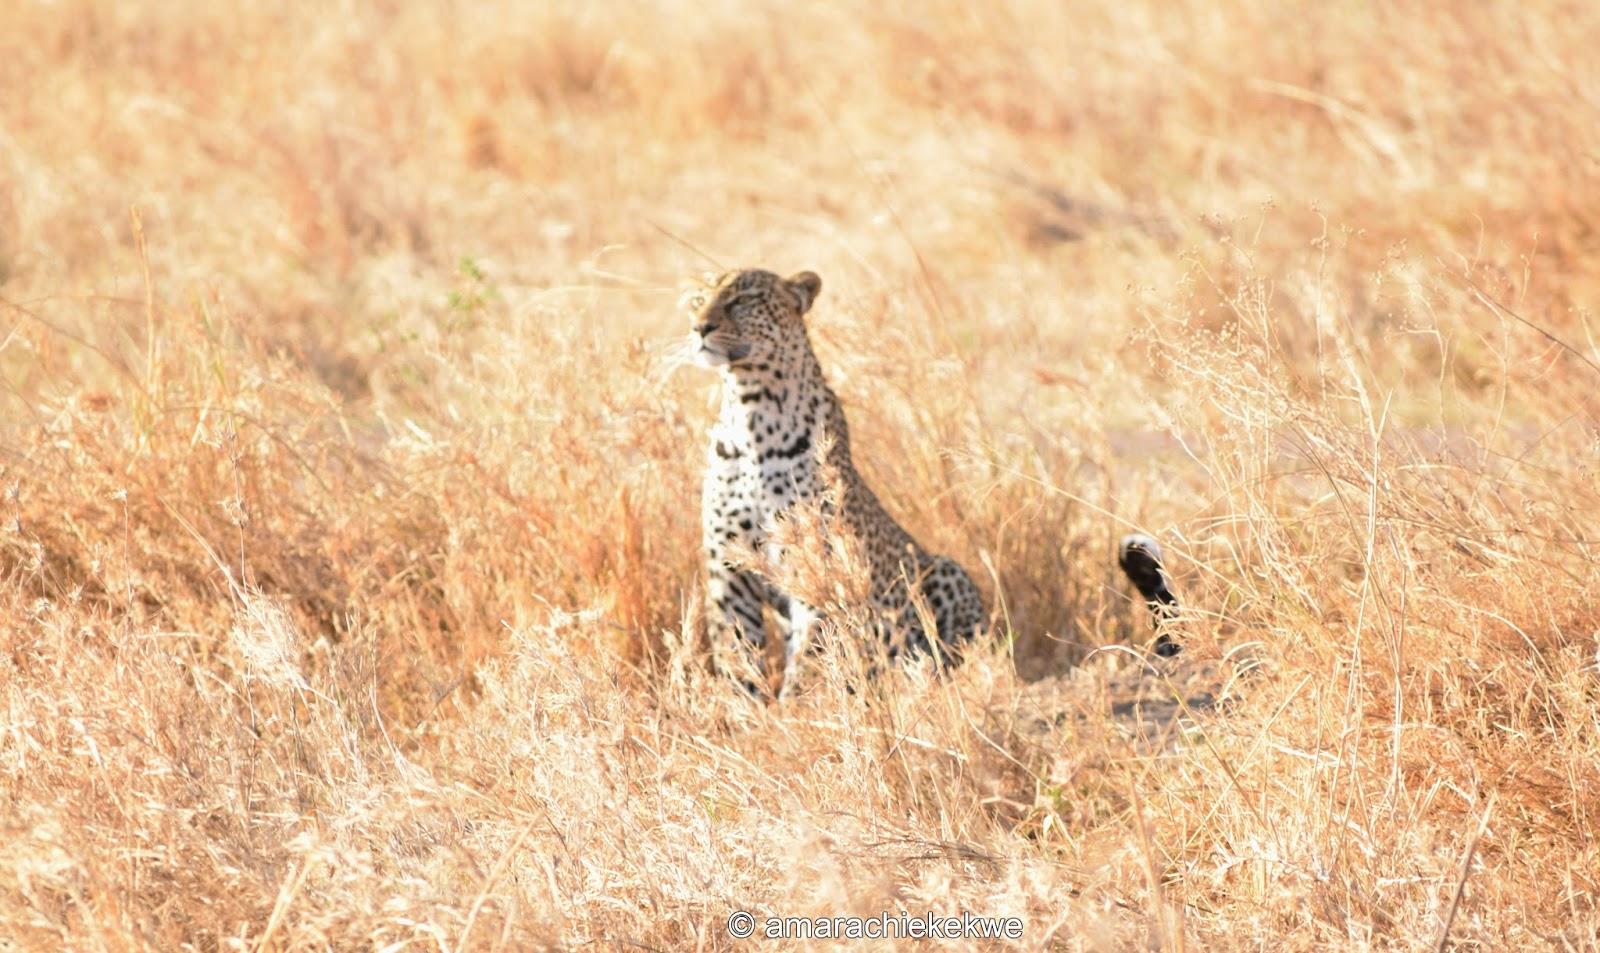 https://i1.wp.com/3.bp.blogspot.com/-wfwqKEgYoPI/WGk4Vq3ghBI/AAAAAAAAXoQ/09rJ-QMU3iAXE6z7uUCMEtyoIHbNdaIDwCLcB/s1600/leopard.jpg?resize=750%2C447&ssl=1